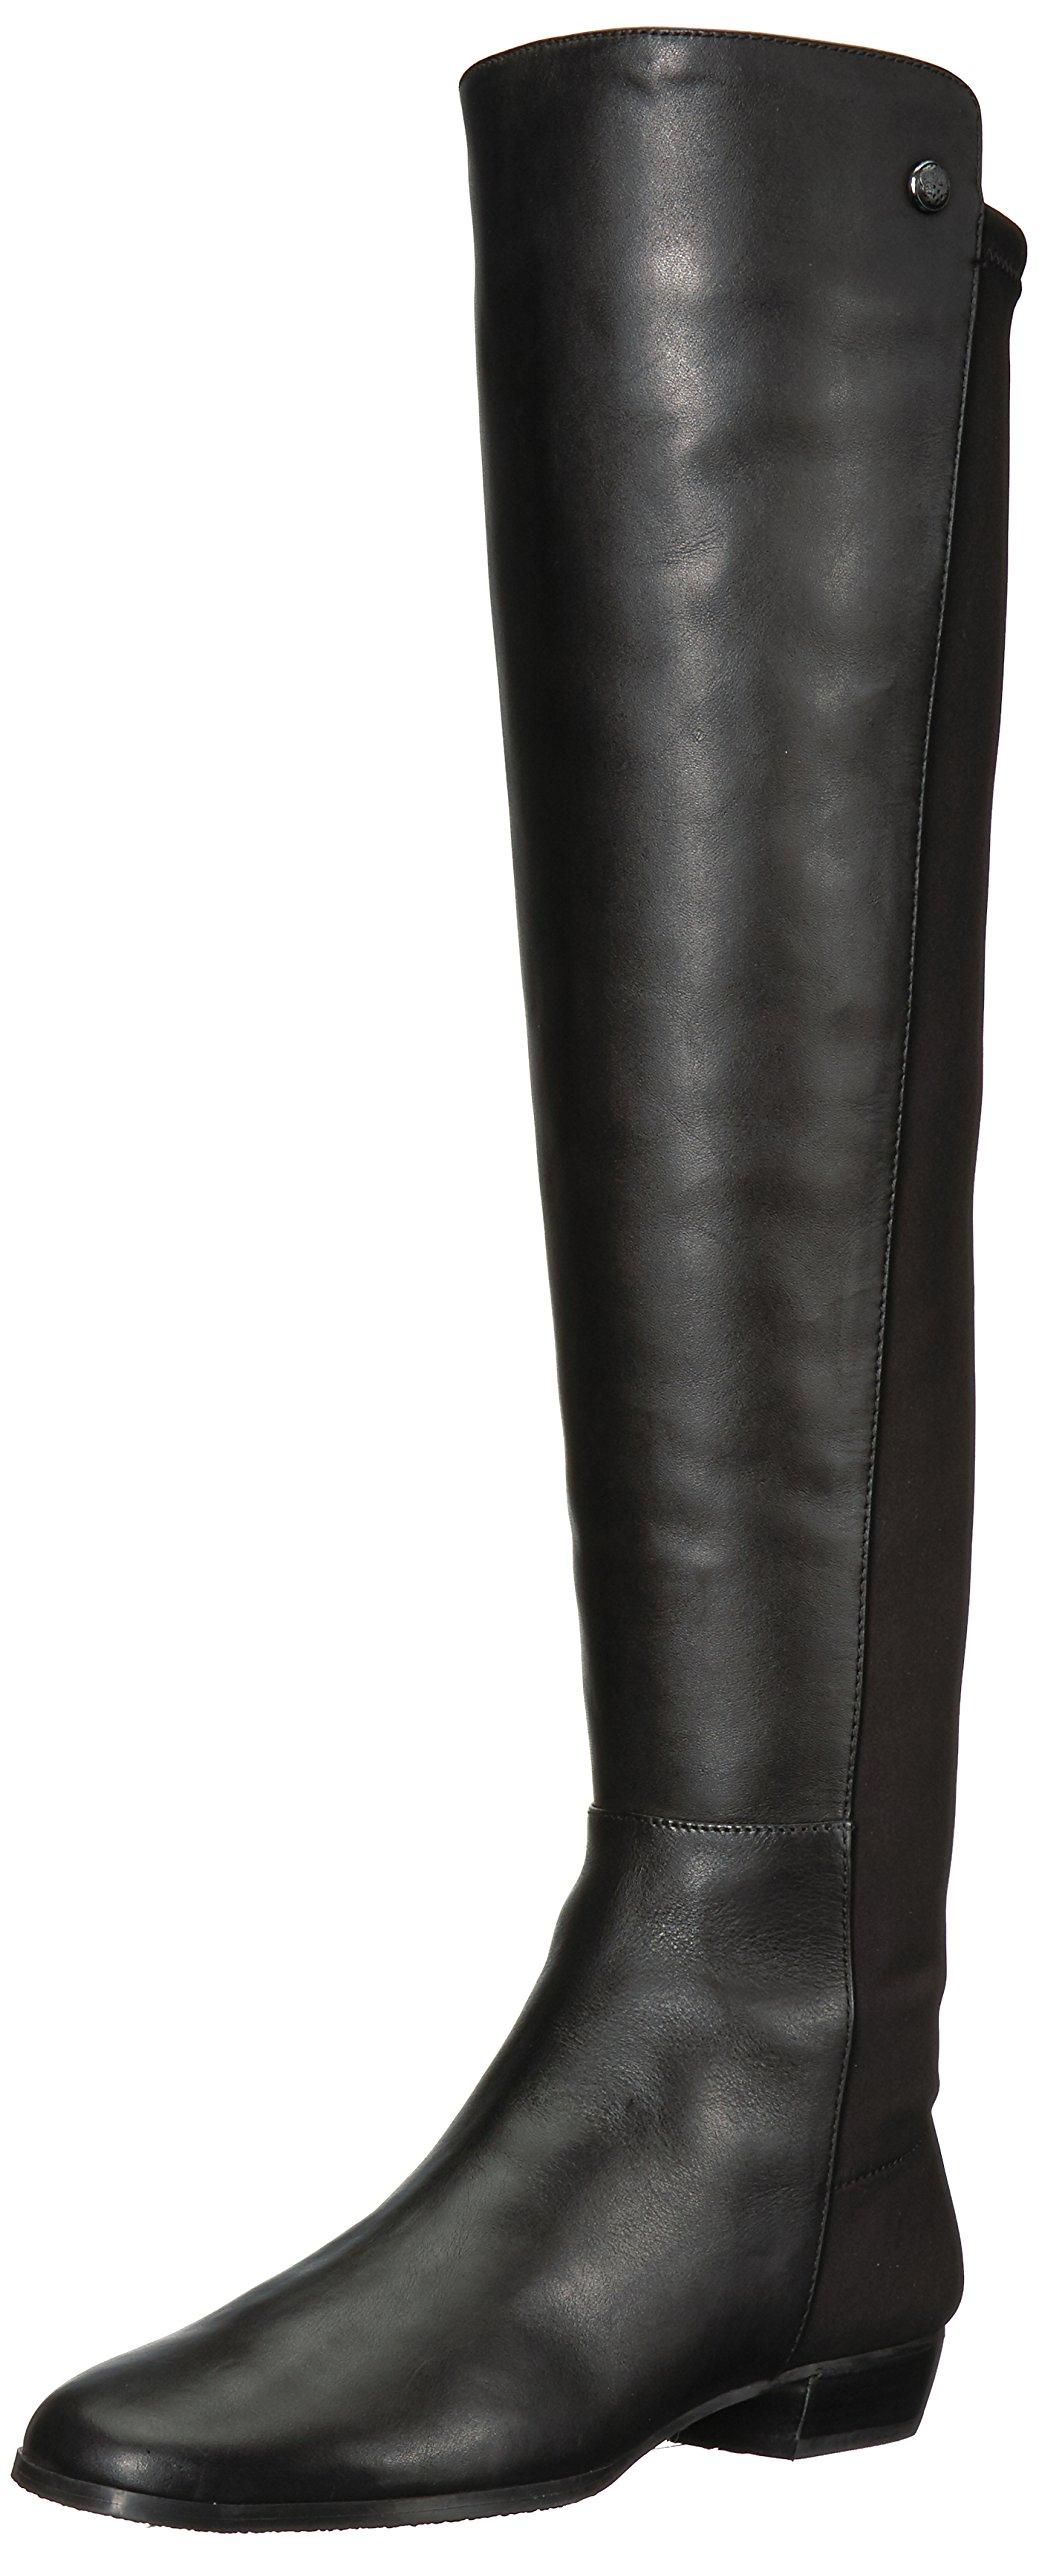 Vince Camuto Women's Karita Over The Knee Boot, Black, 6.5 Medium US